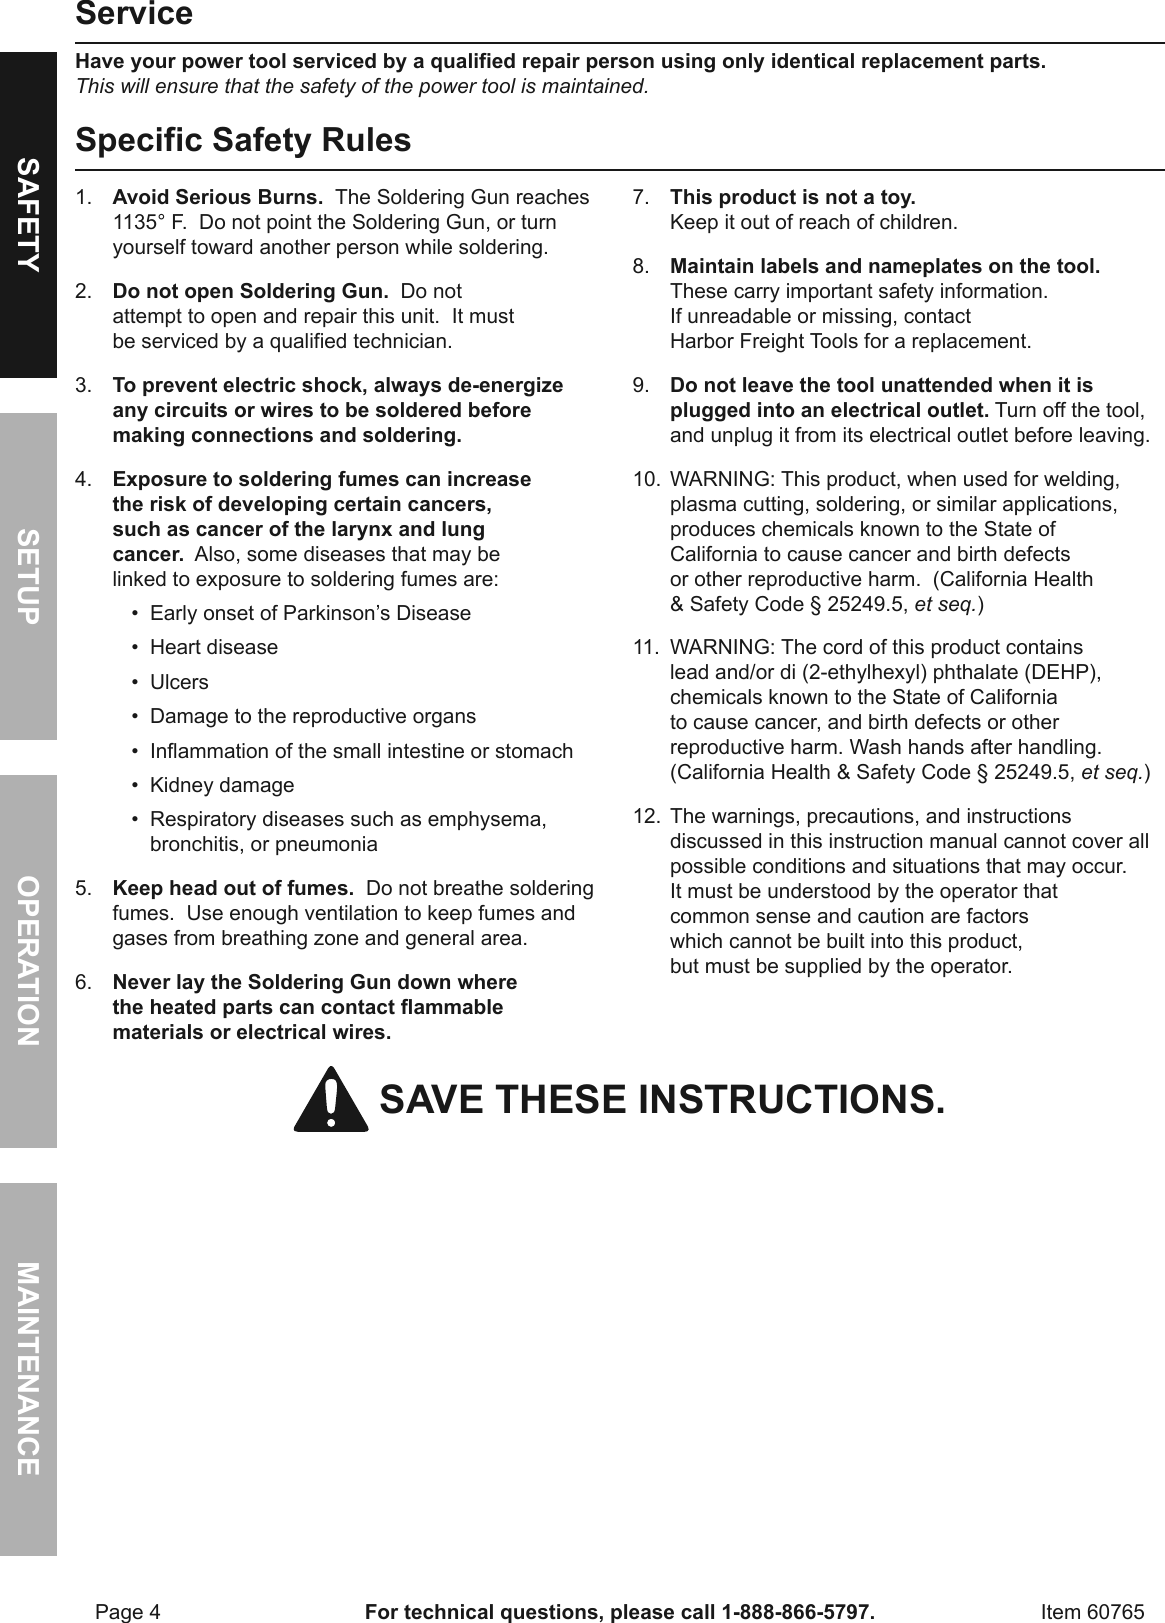 Manual For The 60765 180 Watt Industrial Soldering Gun